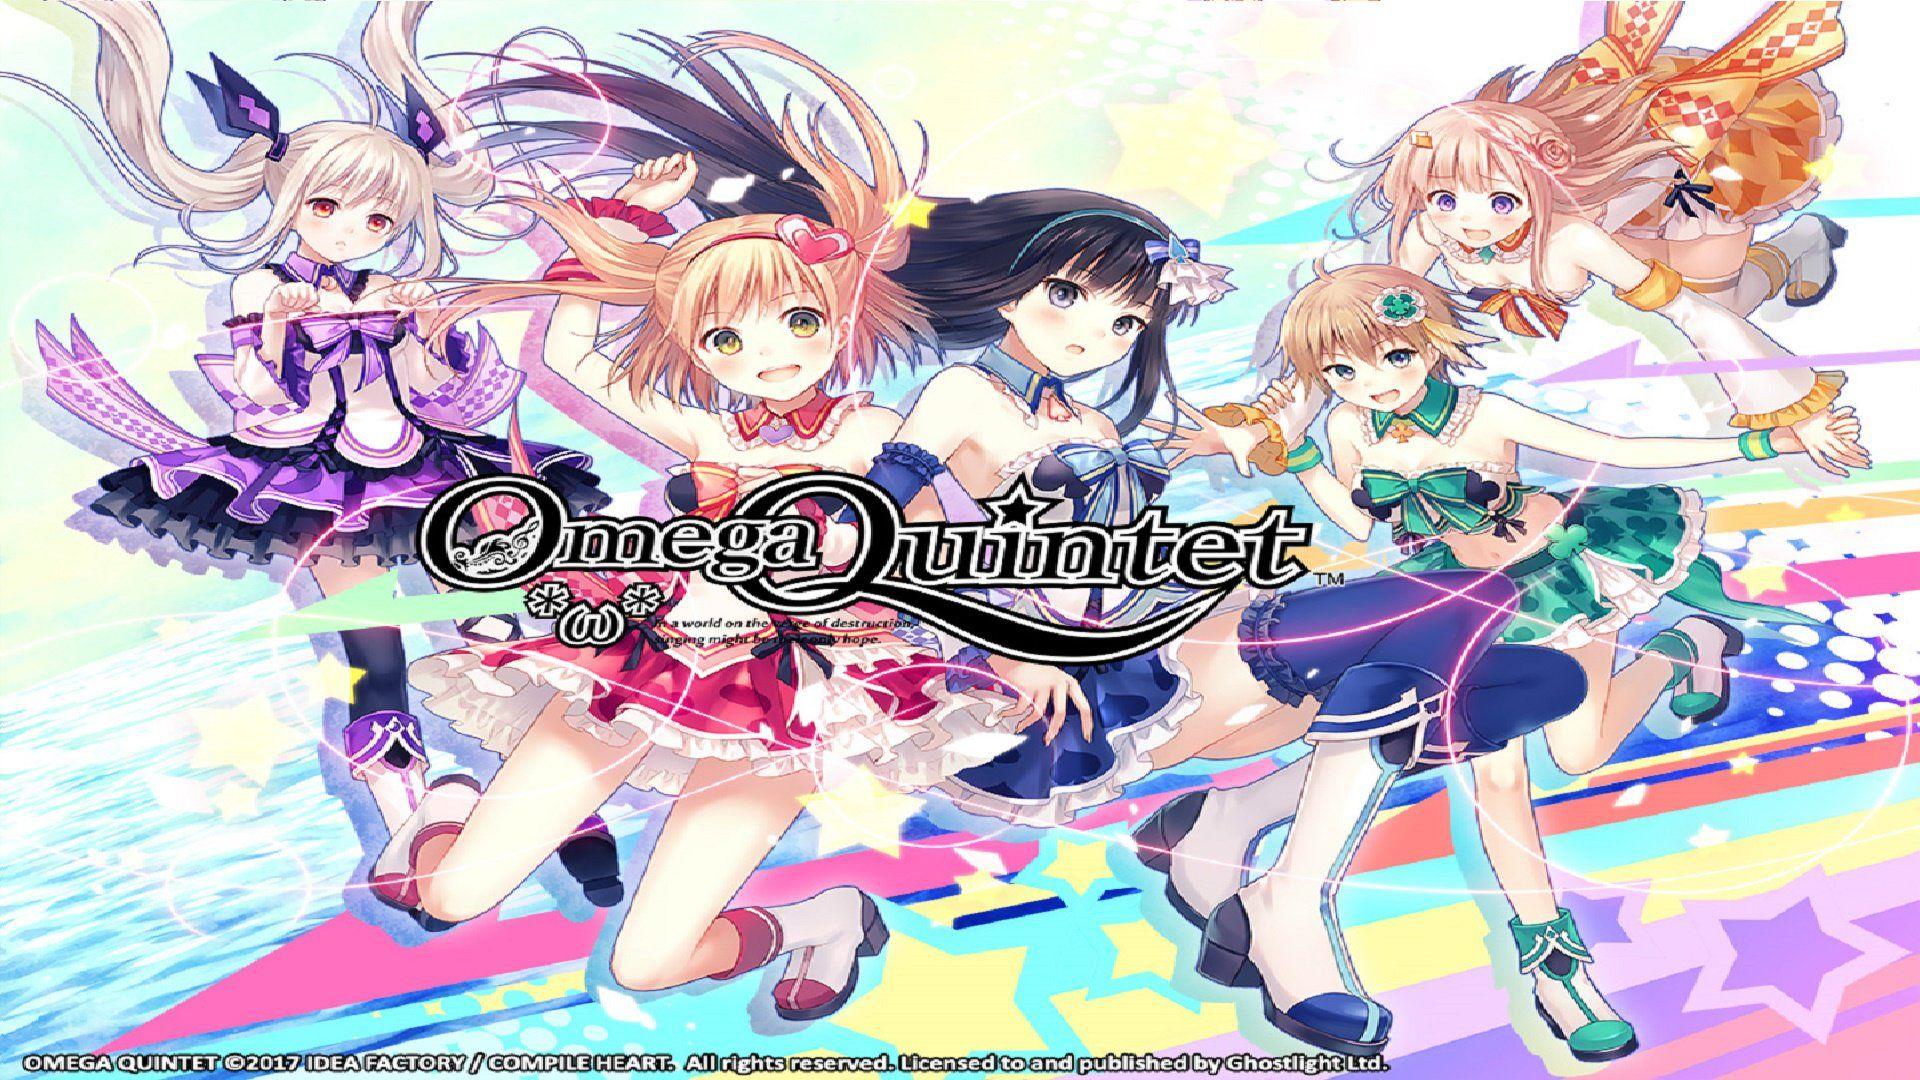 JRPG/Idol Simulation Omega Quintet Coming to PC Omega